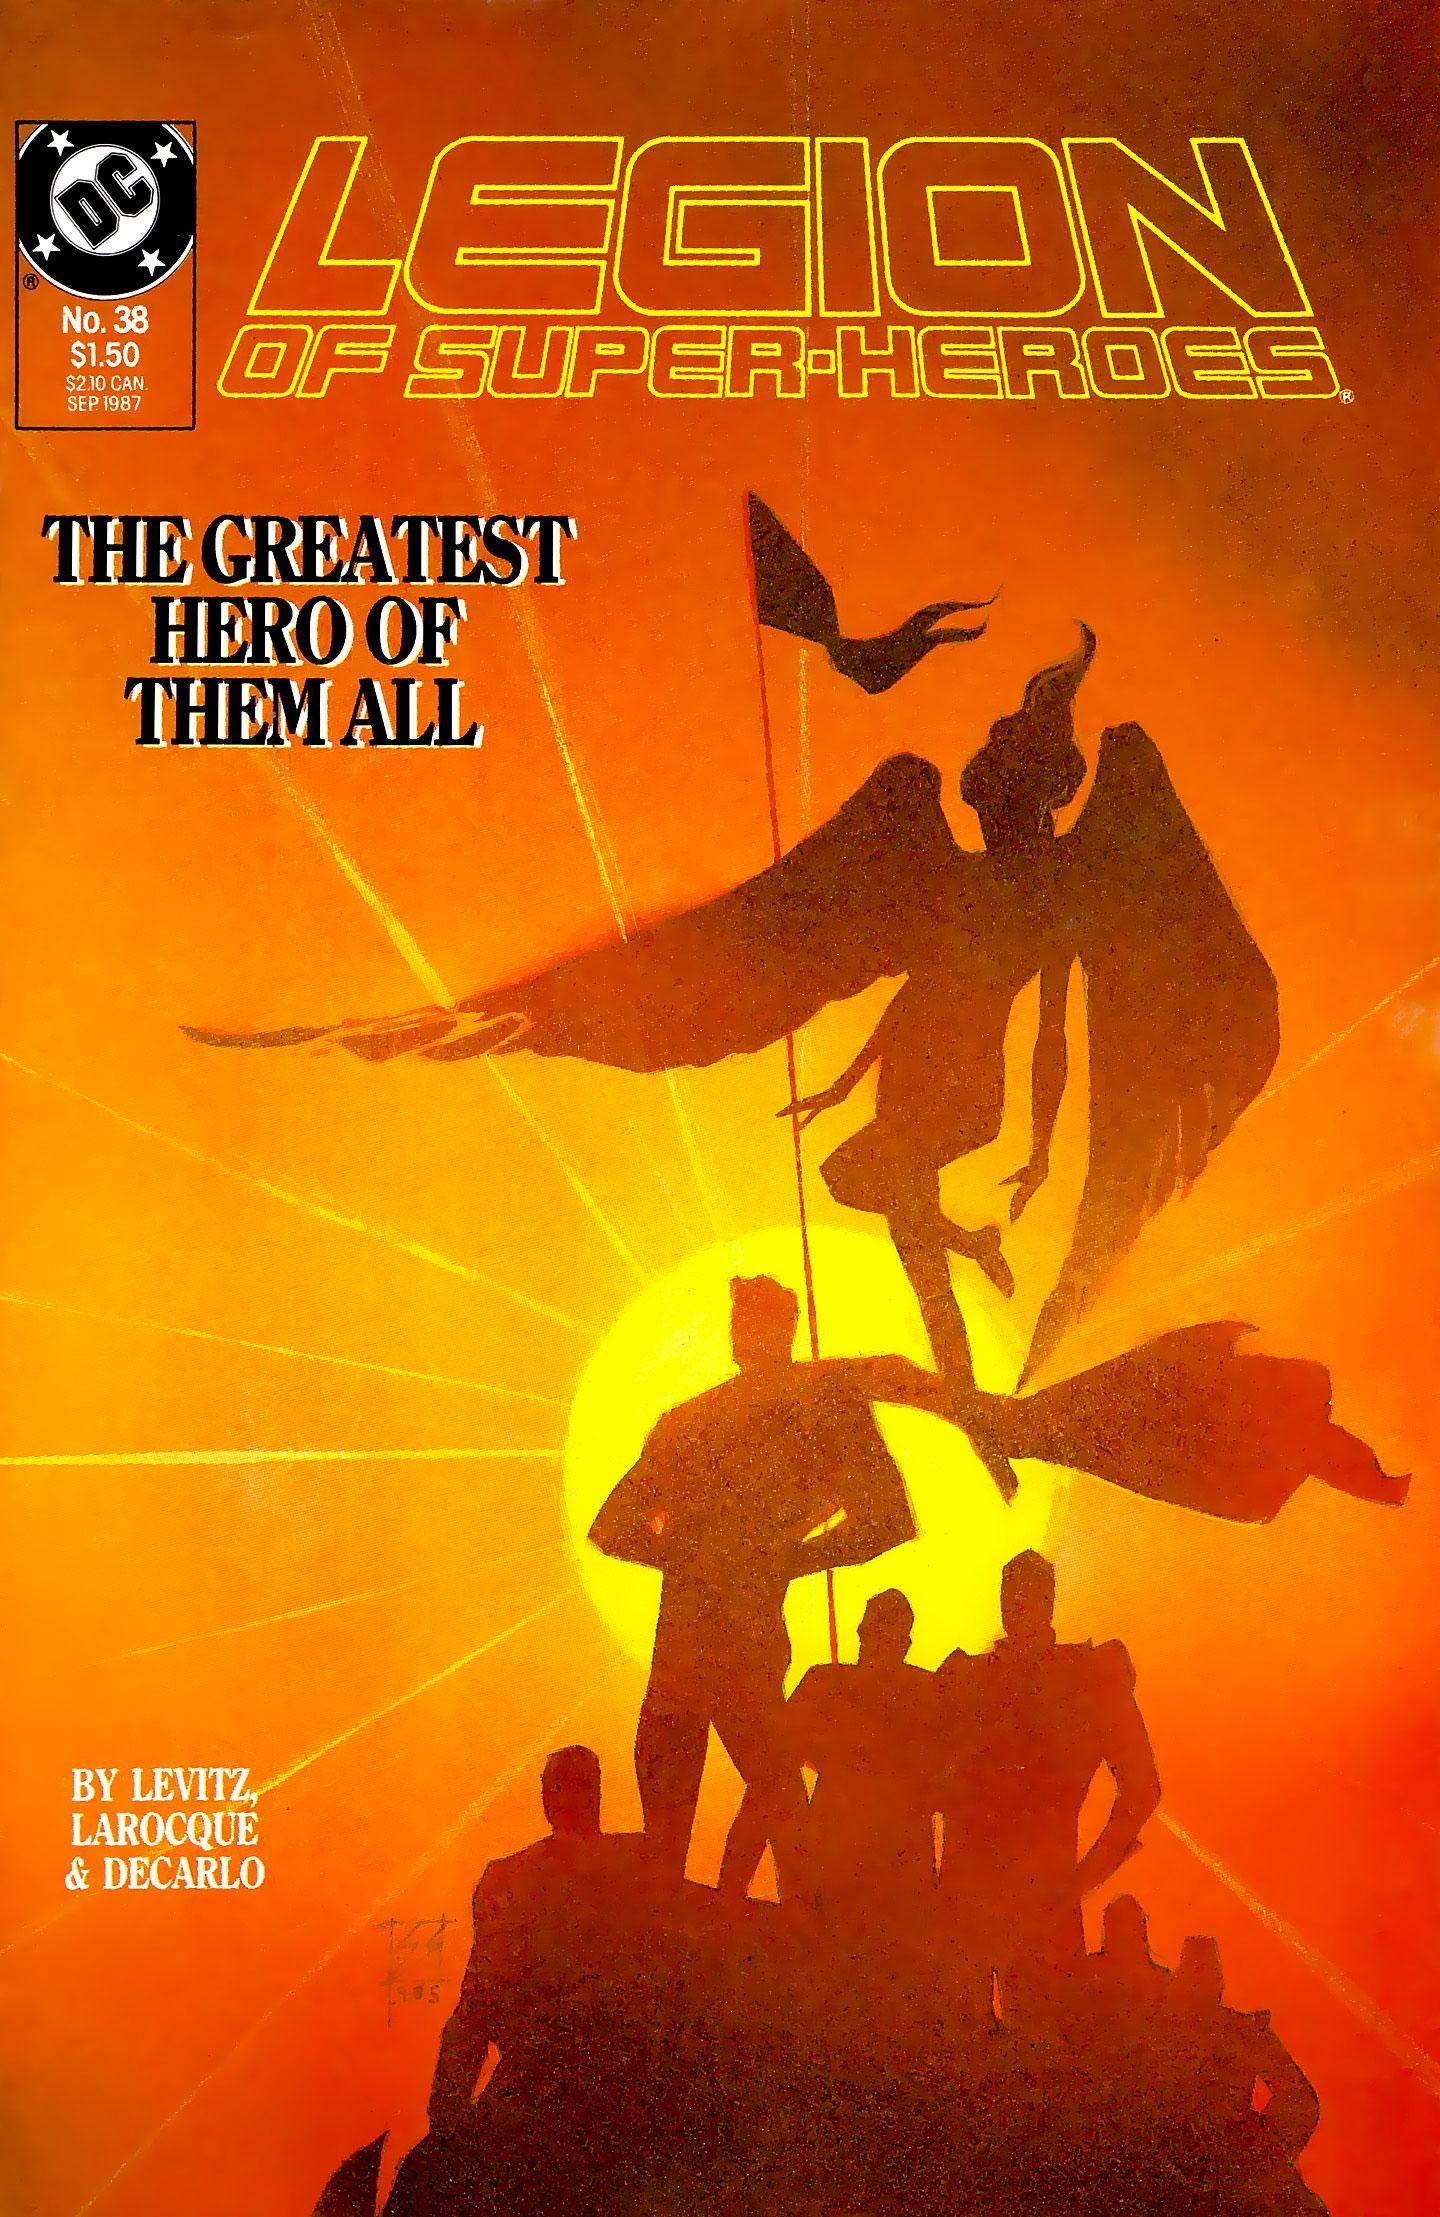 Legion of Super-Heroes v3 038 1987